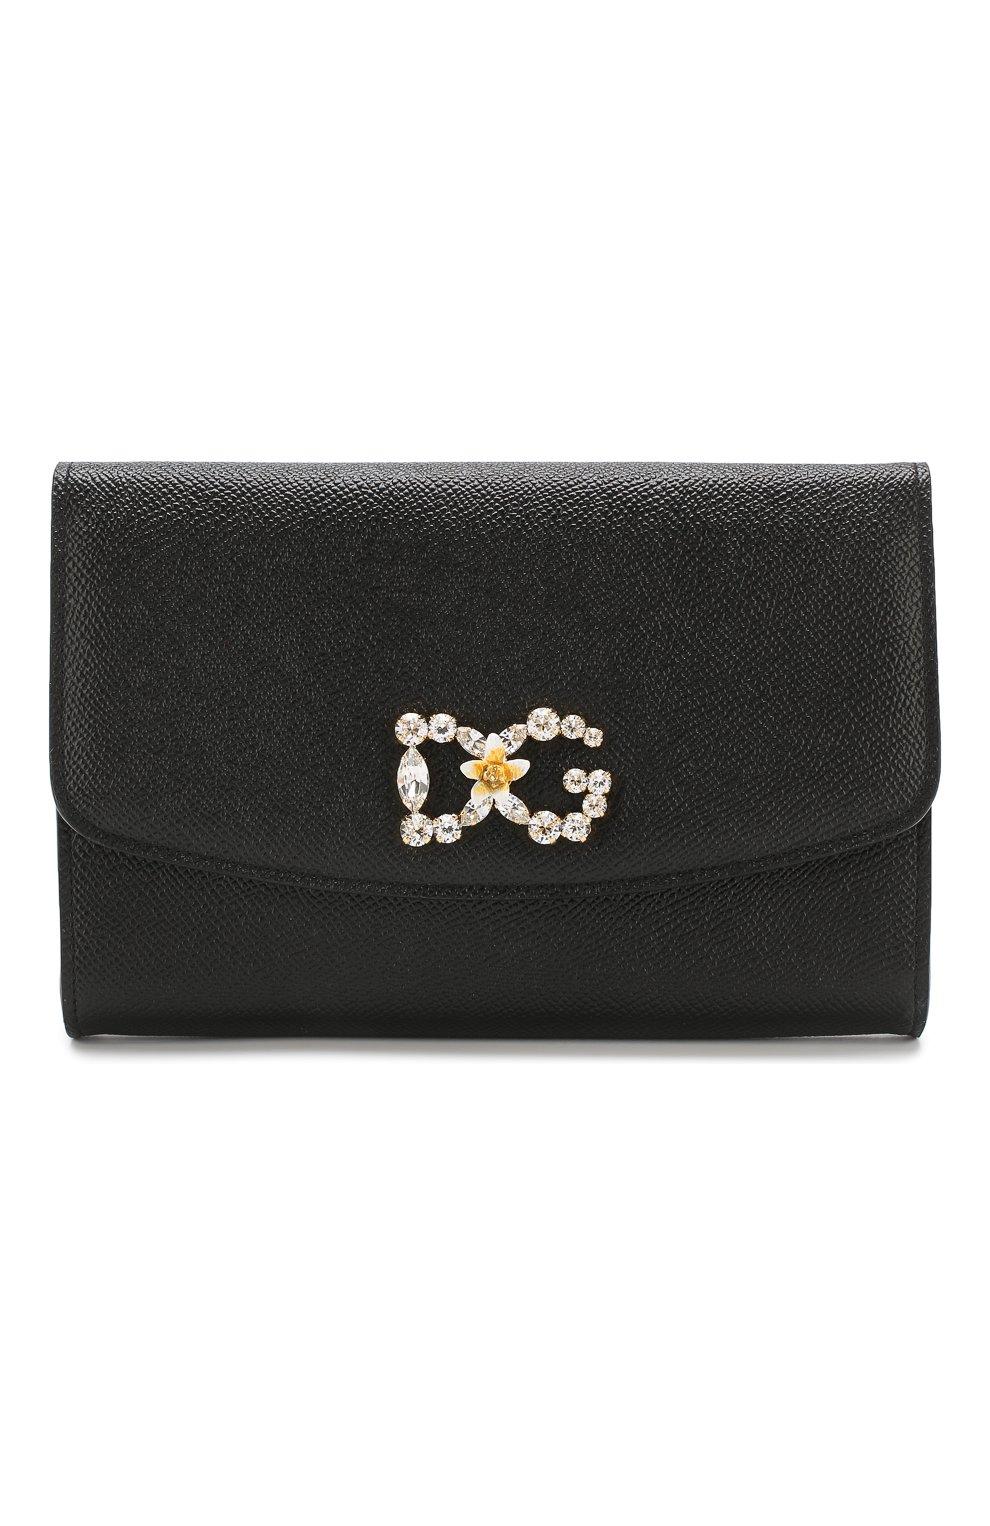 Кожаное портмоне на цепочке Dolce & Gabbana черного цвета | Фото №1